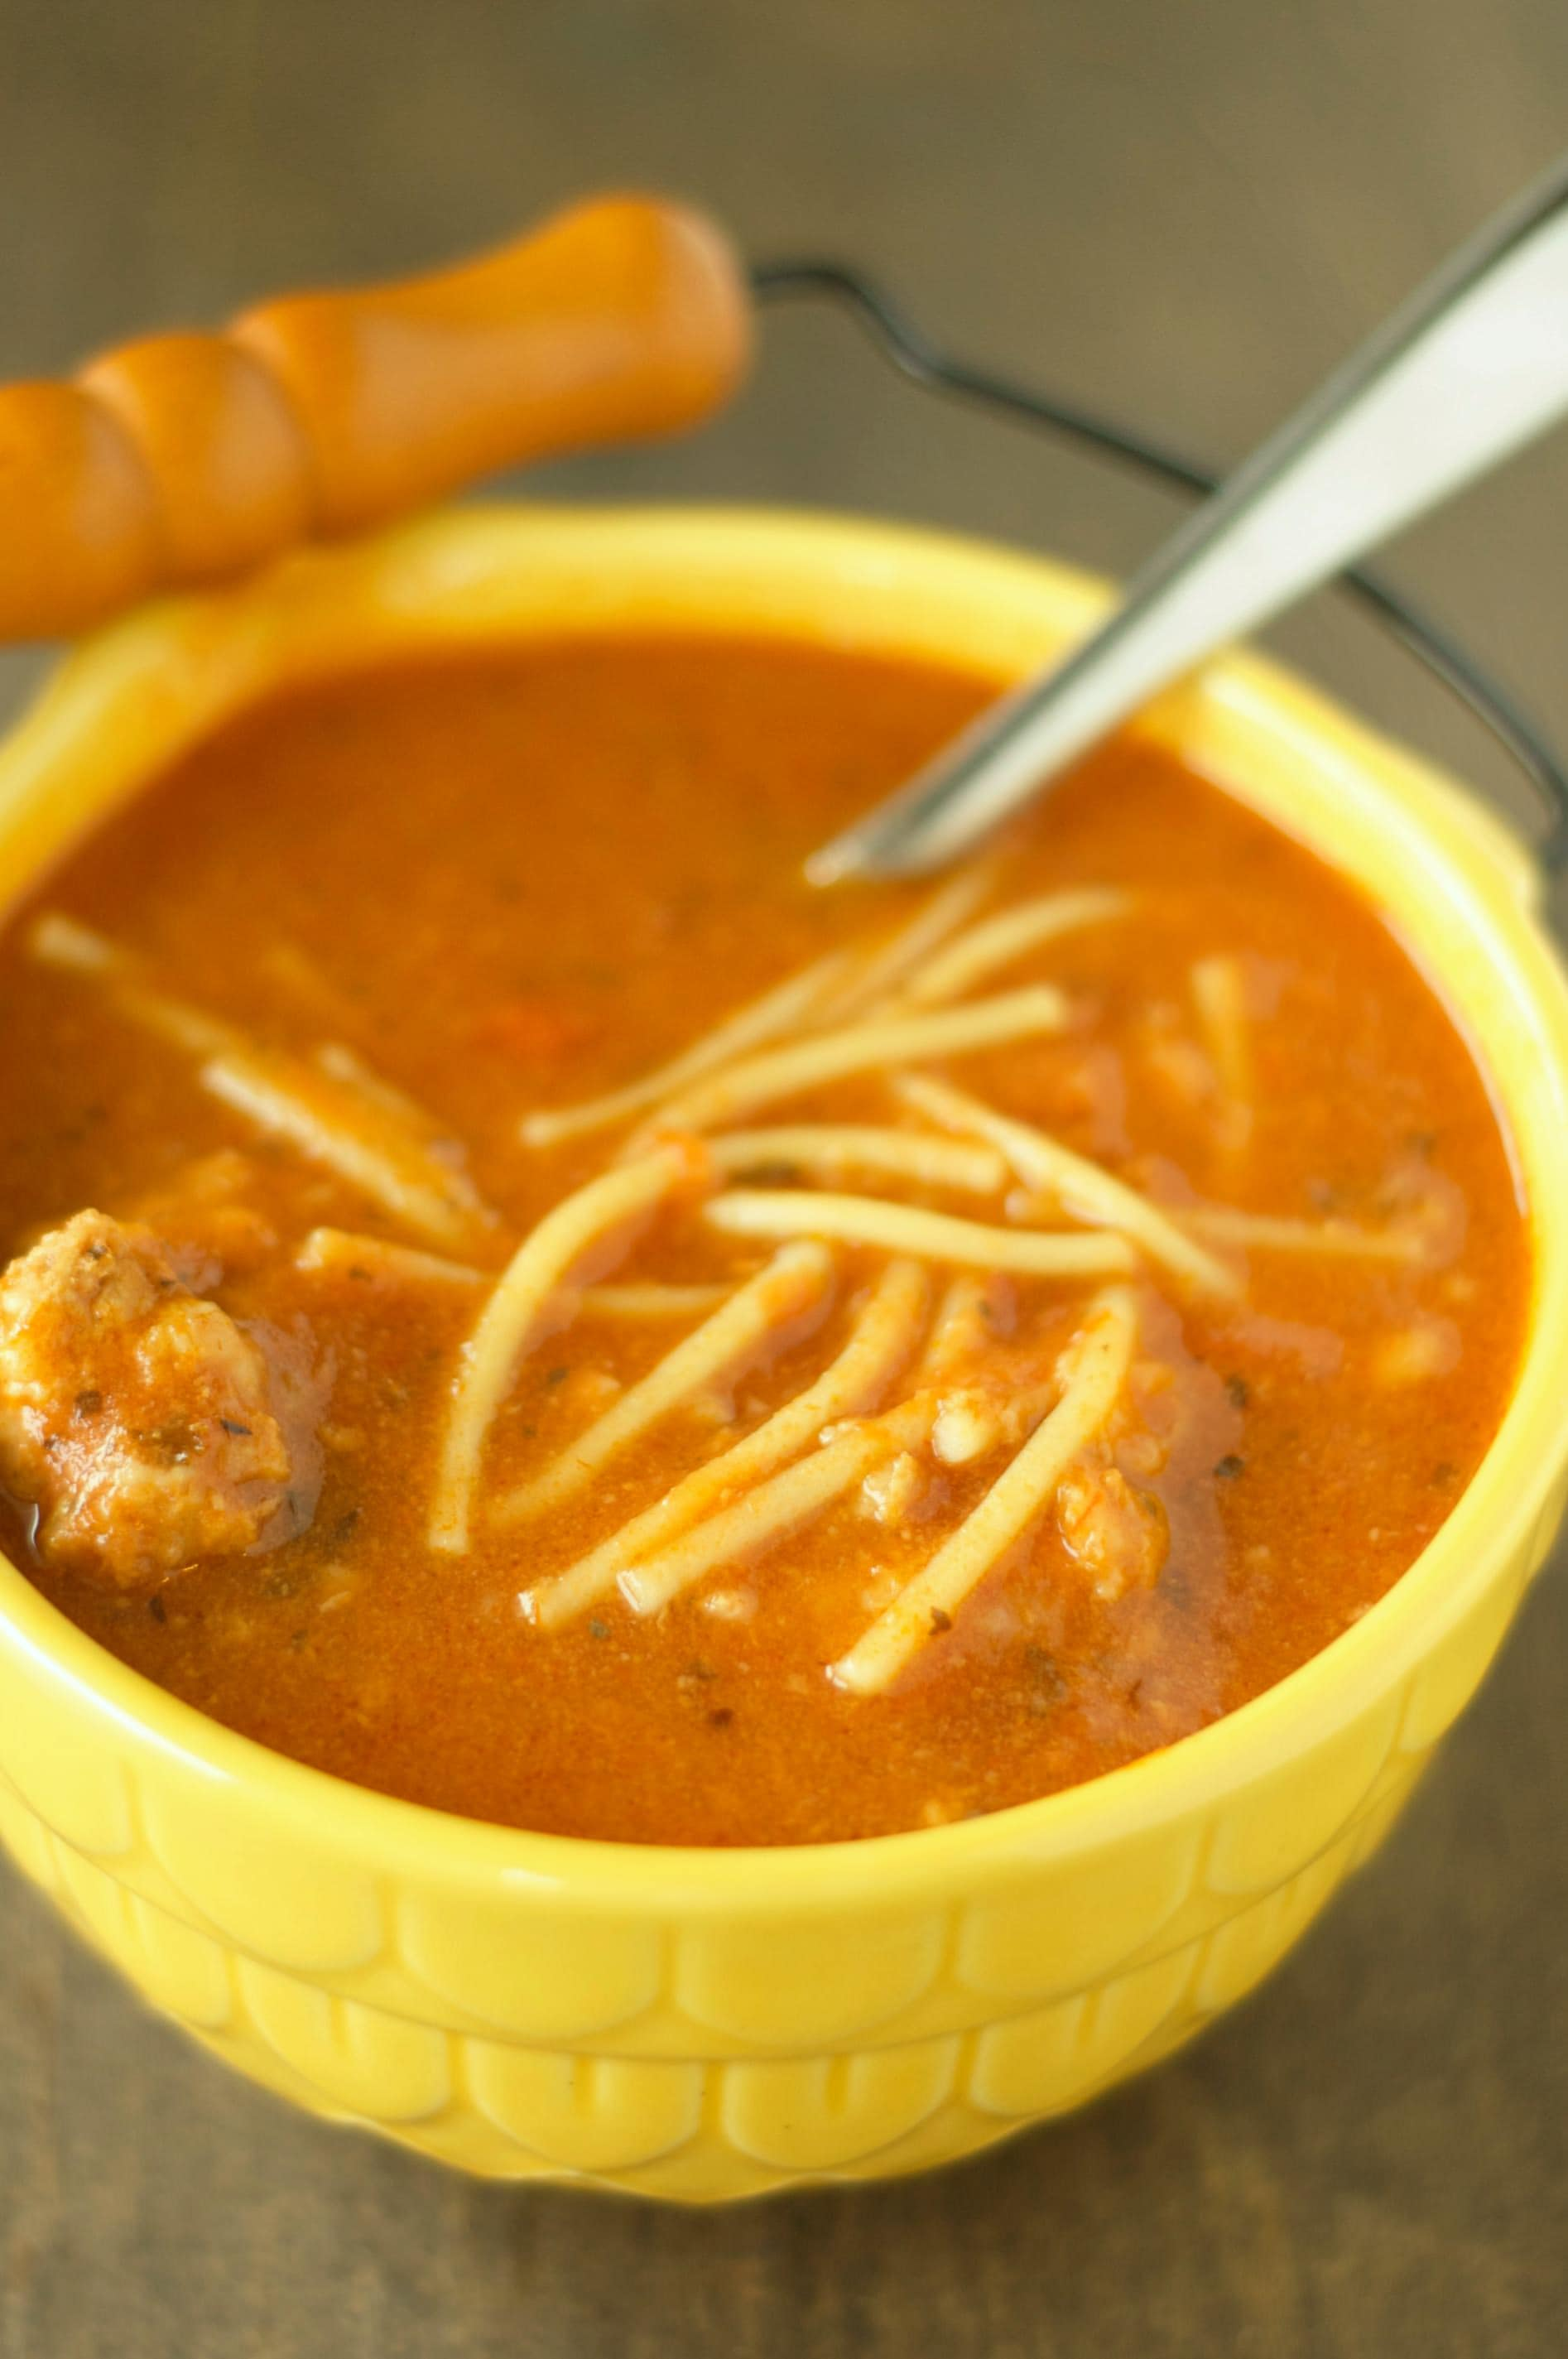 Crockpot Spaghetti and Meatball Soup | Crockpot Gourmet